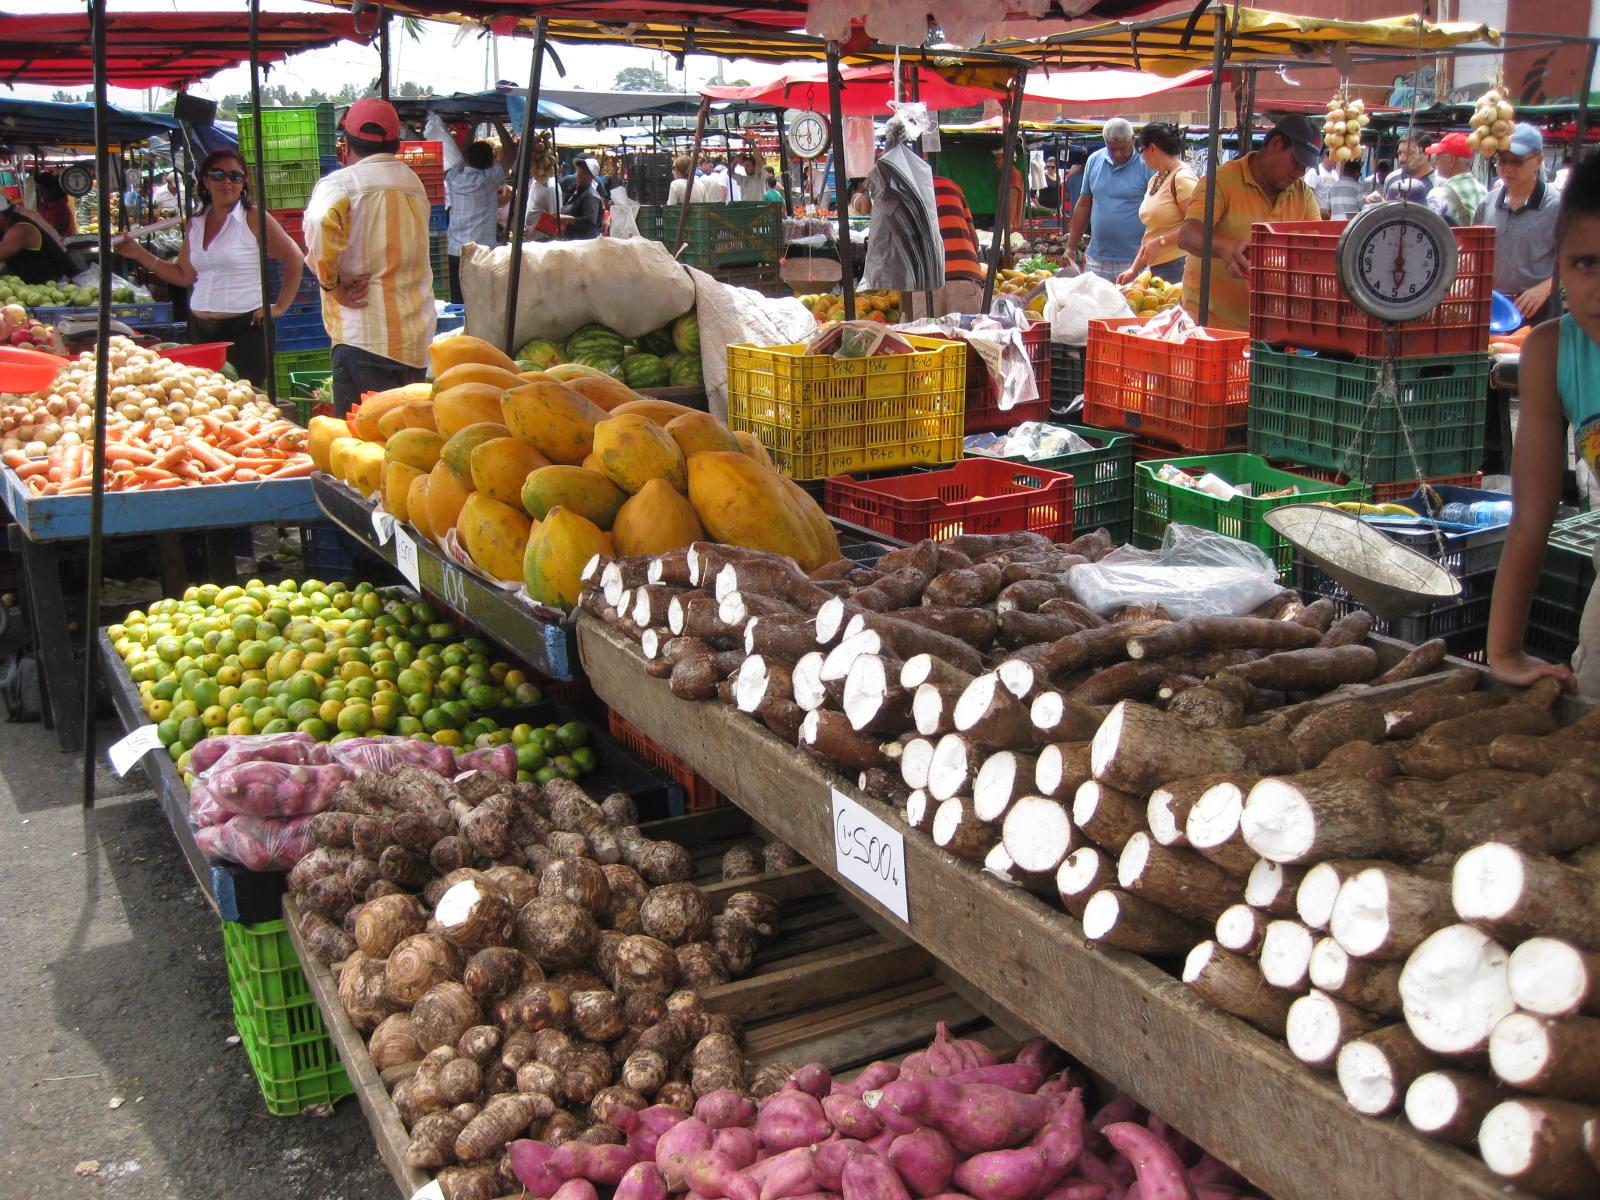 Papayas at Costa Rican Farmer's Market - Alldonemonkey.com